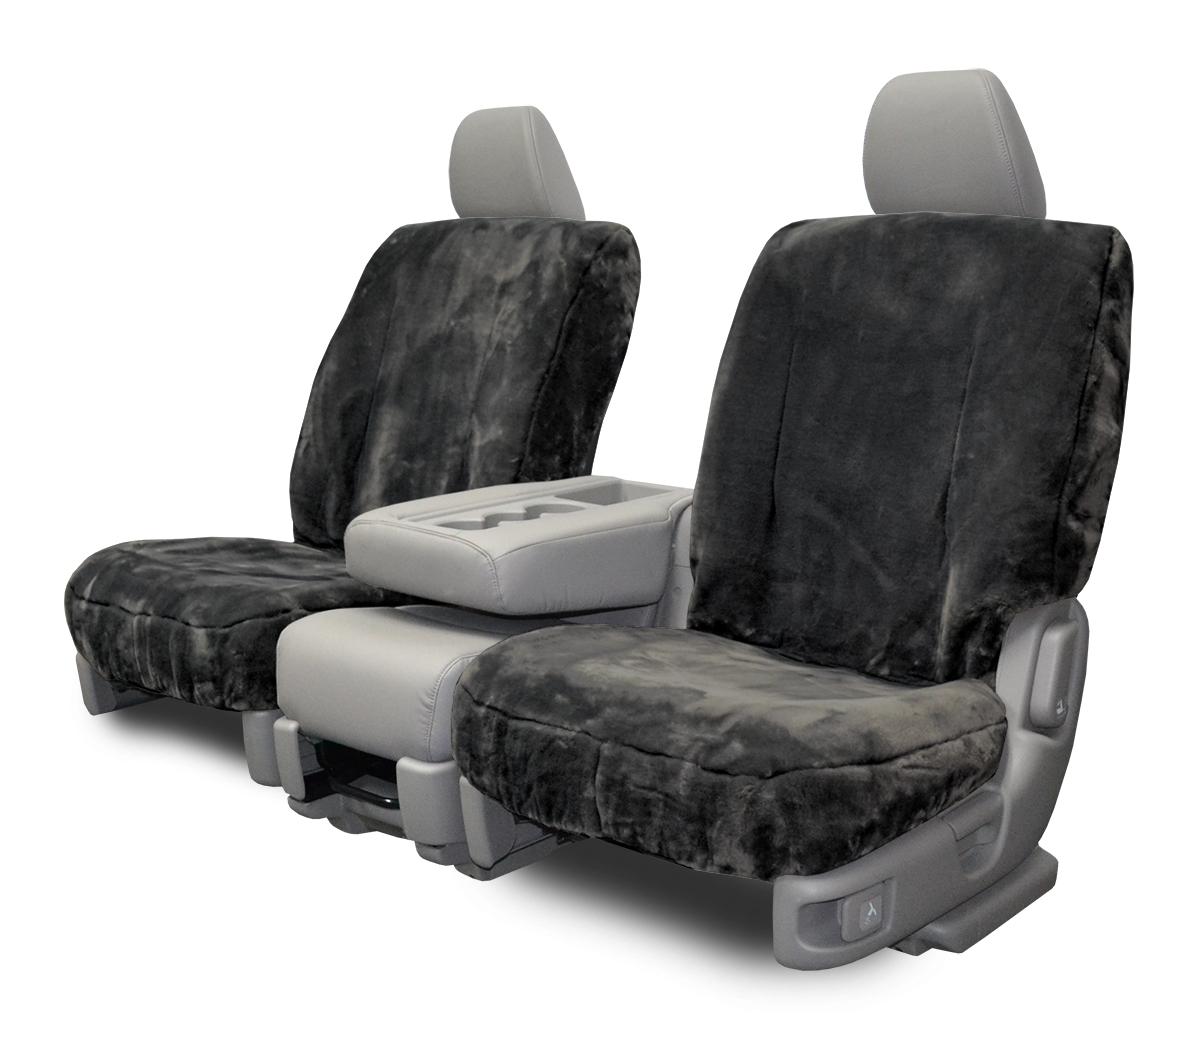 Luxury fleece seat covers seat covers unlimited luxury fleece seat covers jeuxipadfo Choice Image